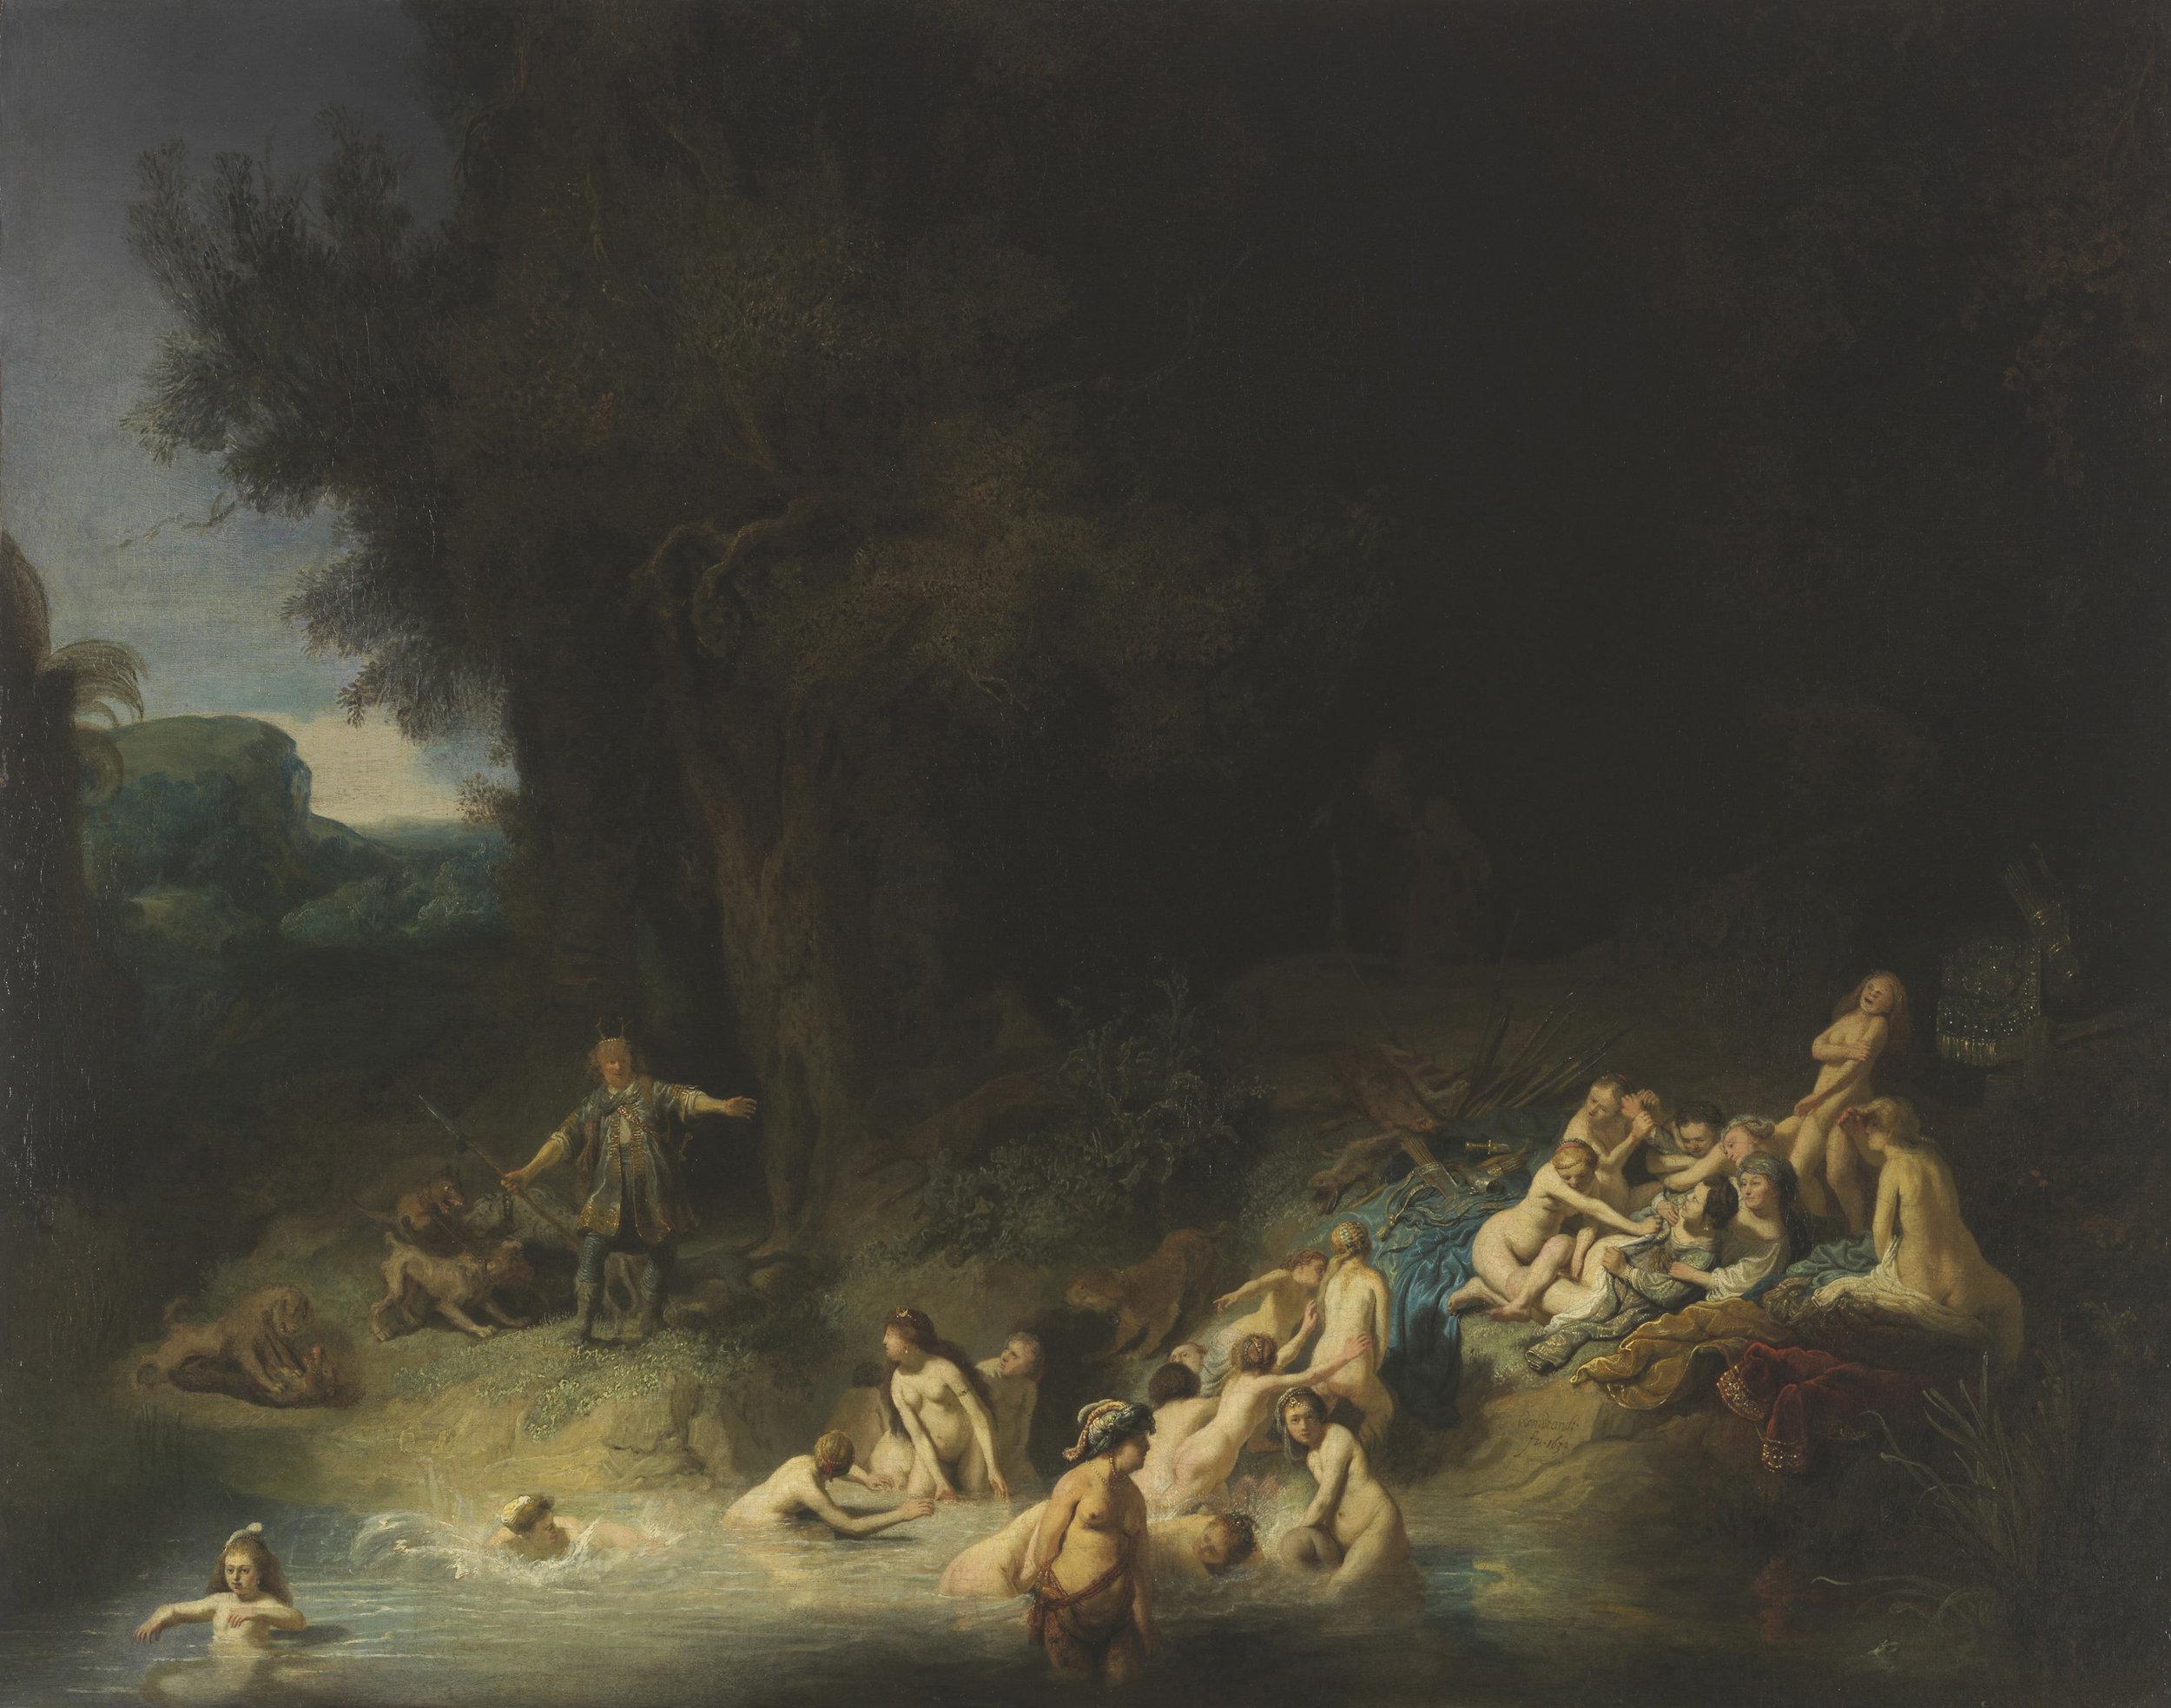 Rembrandt van Rijn, Diana Bathing with her Nymphs with Actaeon and Callisto,  1634.https://commons.wikimedia.org/wiki/File:Rembrandt,_Harmenszoon_van_Rijn_-_Diana_mit_Akt%C3%A4on_und_Kallisto_-_c.1634-1635.jpg